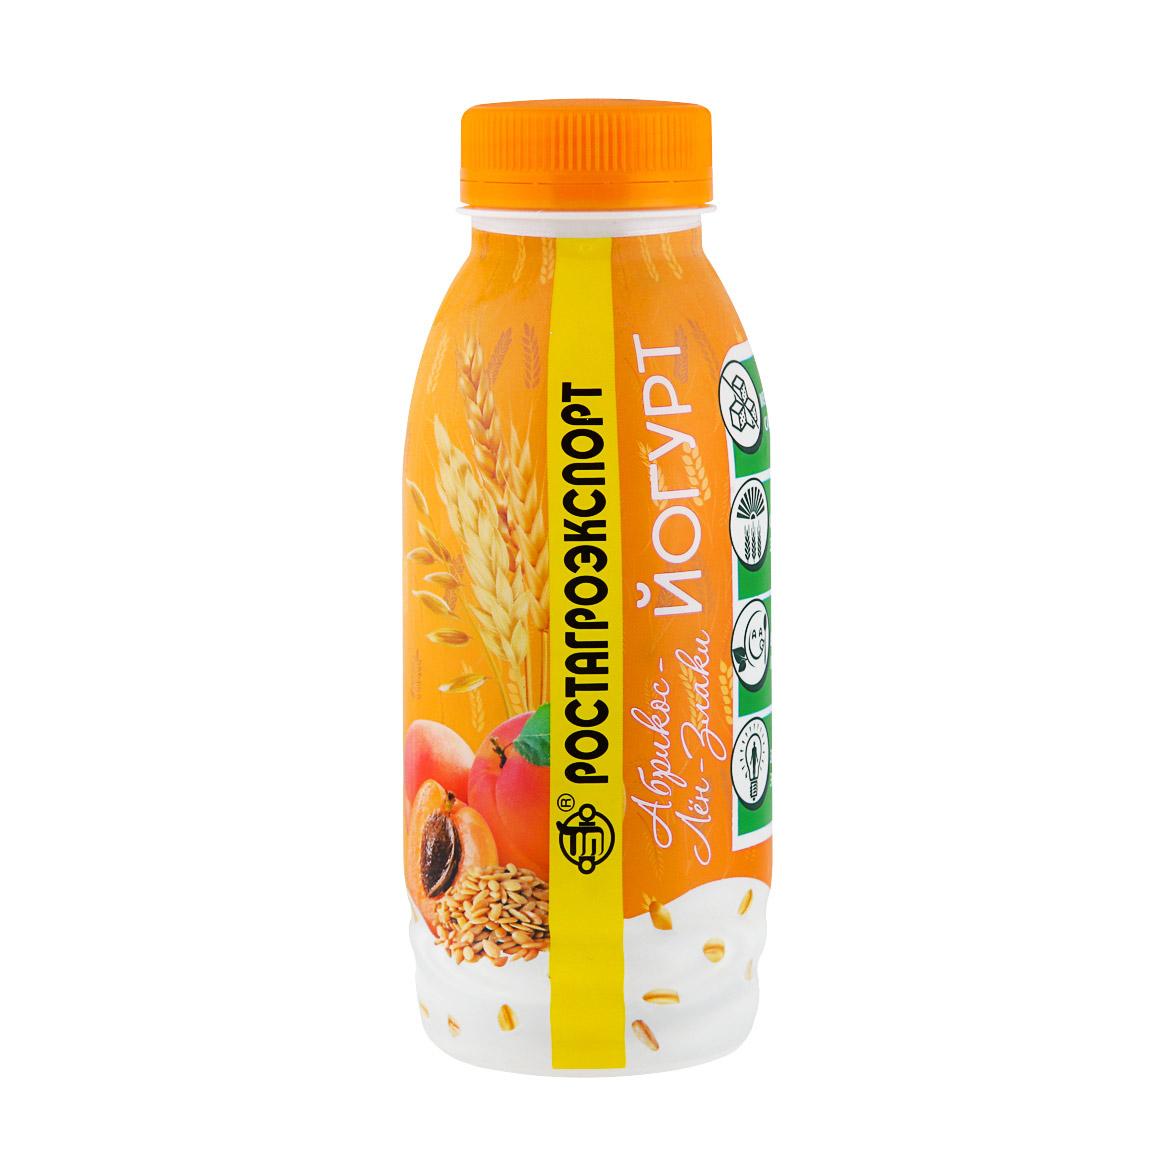 Йогурт РостАгроЭкспорт Абрикос лён злаки 2,5% 290 г фото